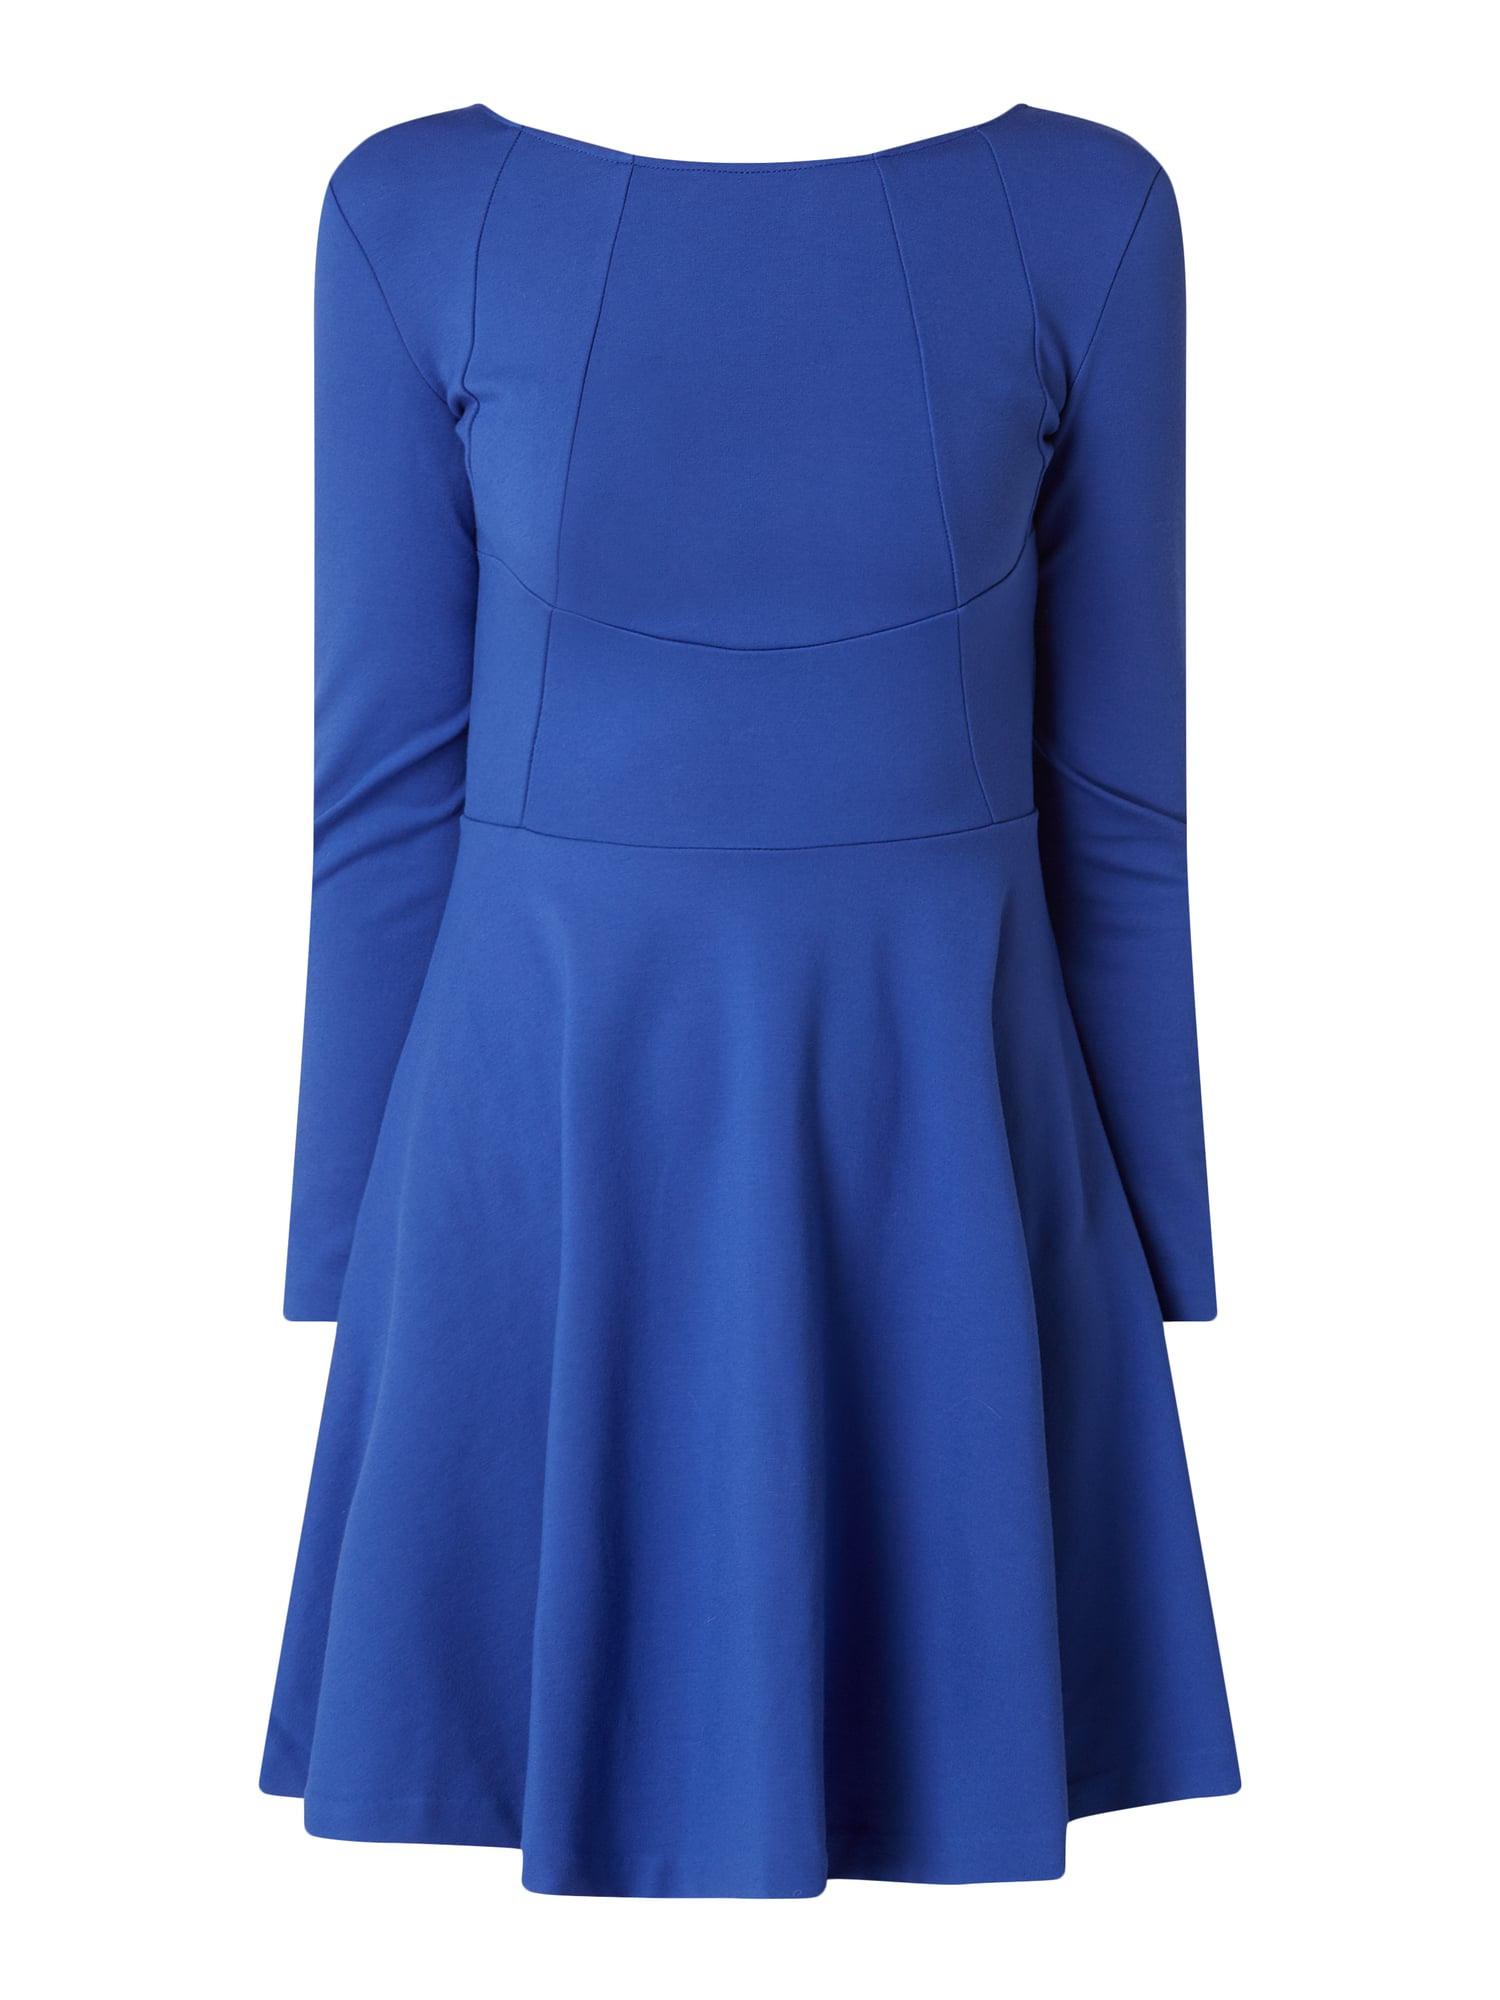 17 Wunderbar Royalblau Kleid Ärmel13 Perfekt Royalblau Kleid Vertrieb